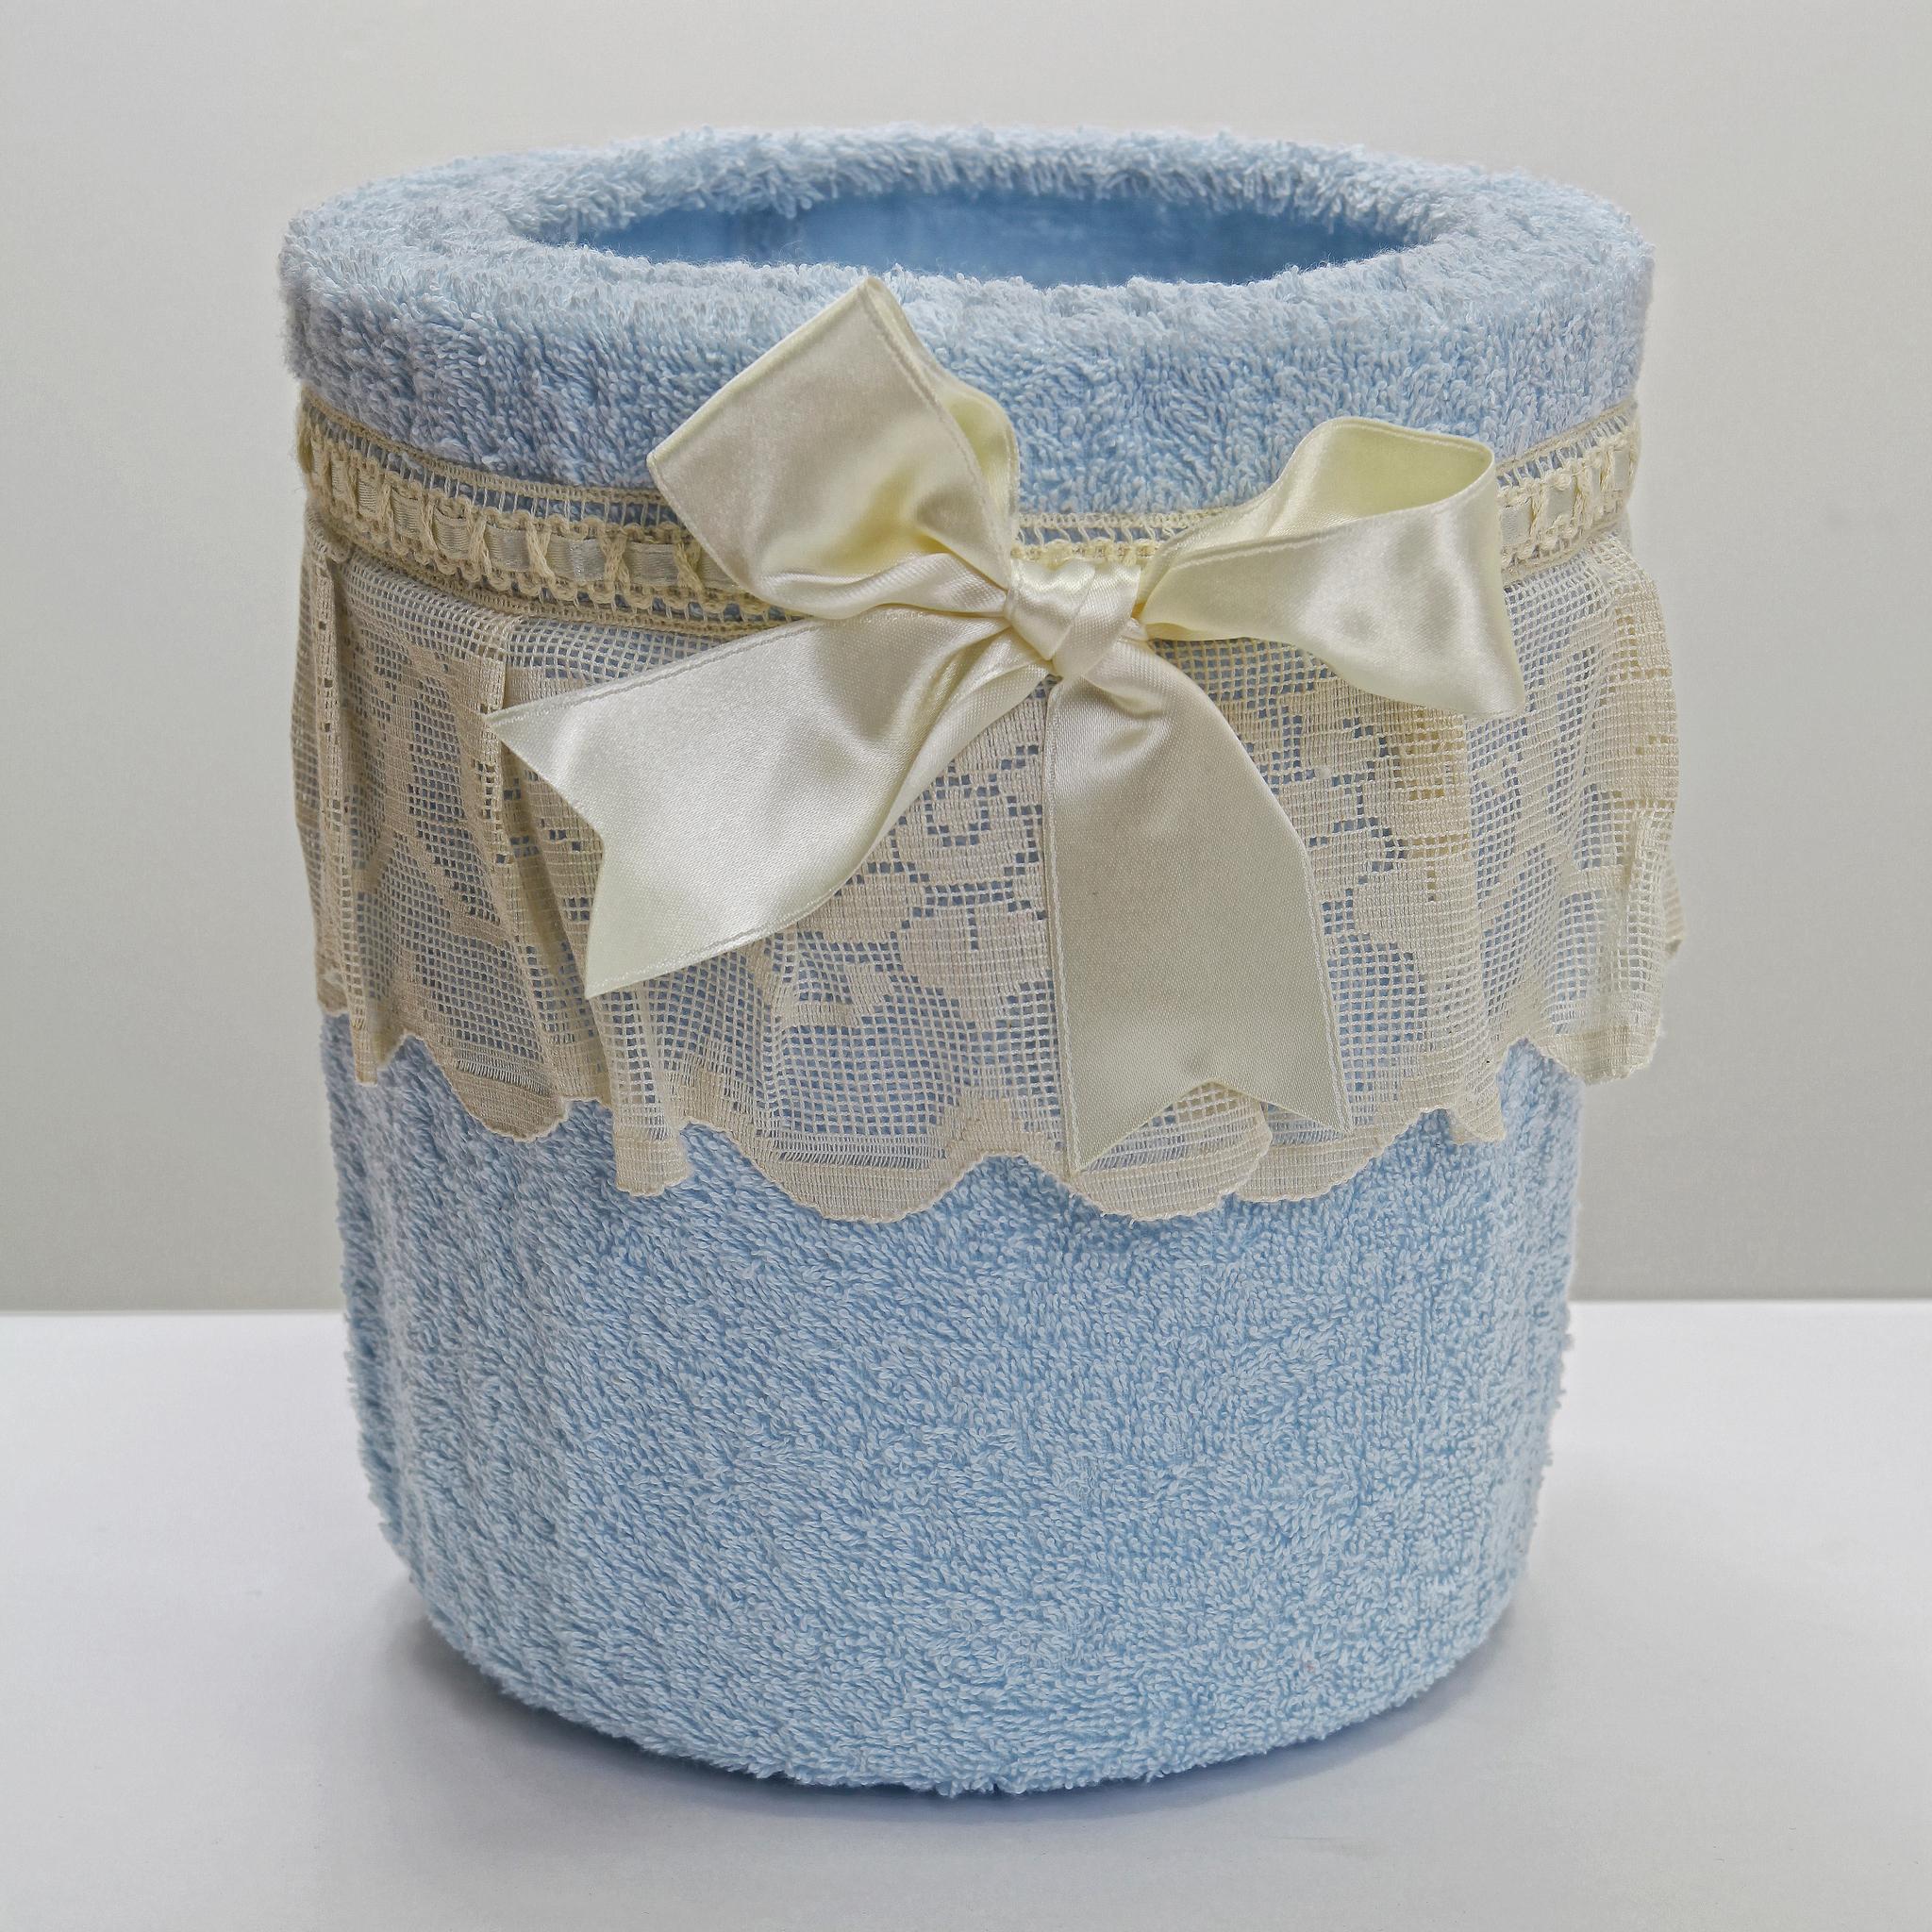 Ведра для мусора Ведро для мусора в ванную 20 Old Florence Buratto голубое vedro-dlya-musora-v-vannuyu-buratto-goluboe-ot-old-florence-italiya.JPG